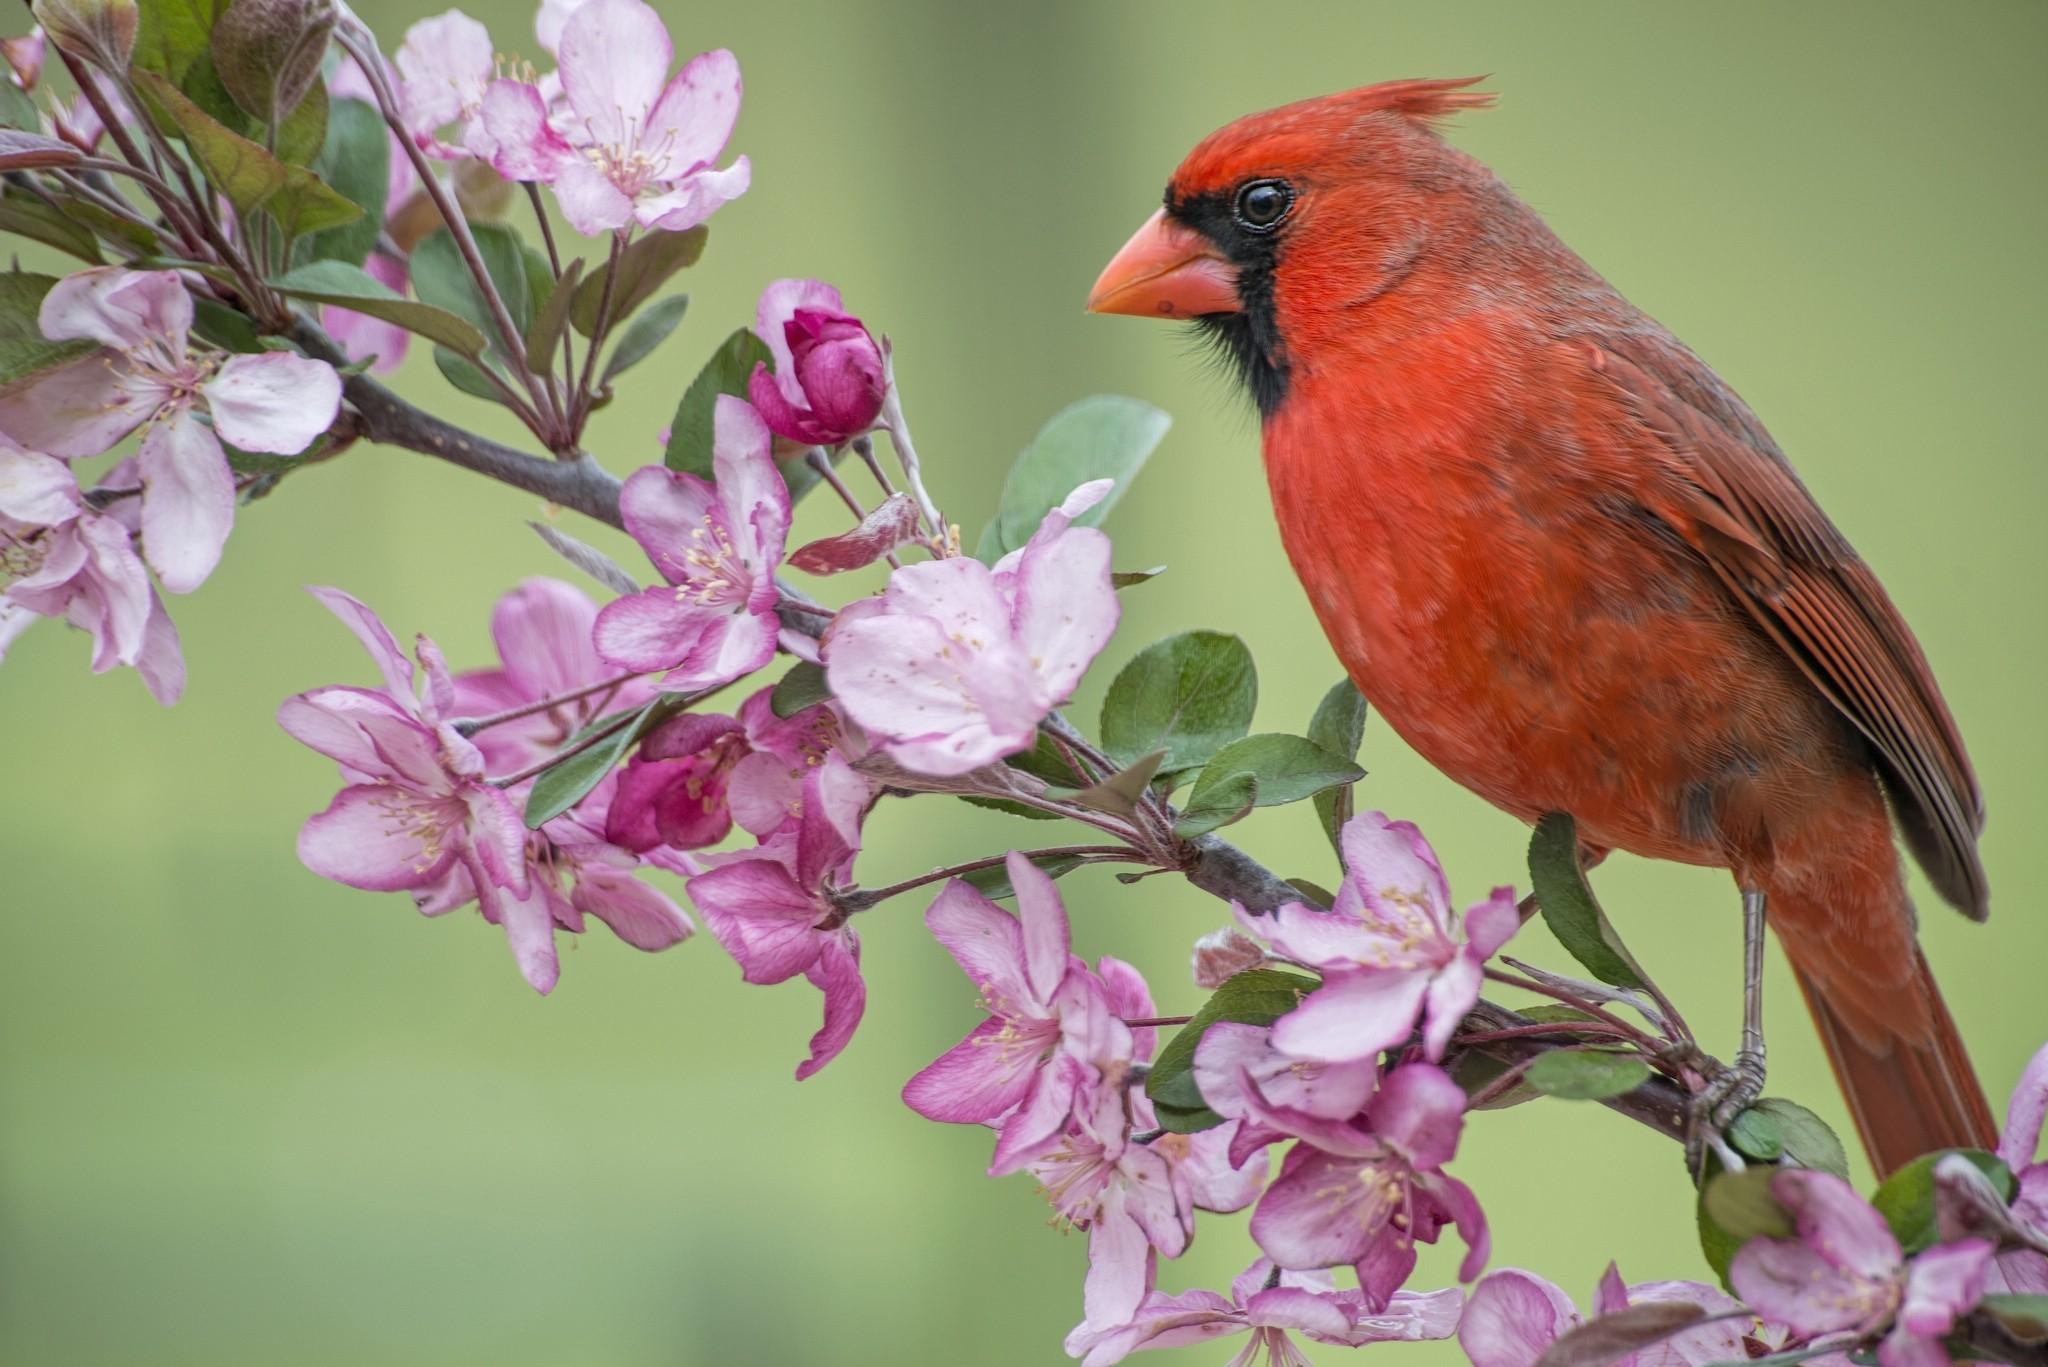 Res: 2048x1367, Animal - Cardinal Animal Bird Northern Cardinal Branch Flower Wallpaper